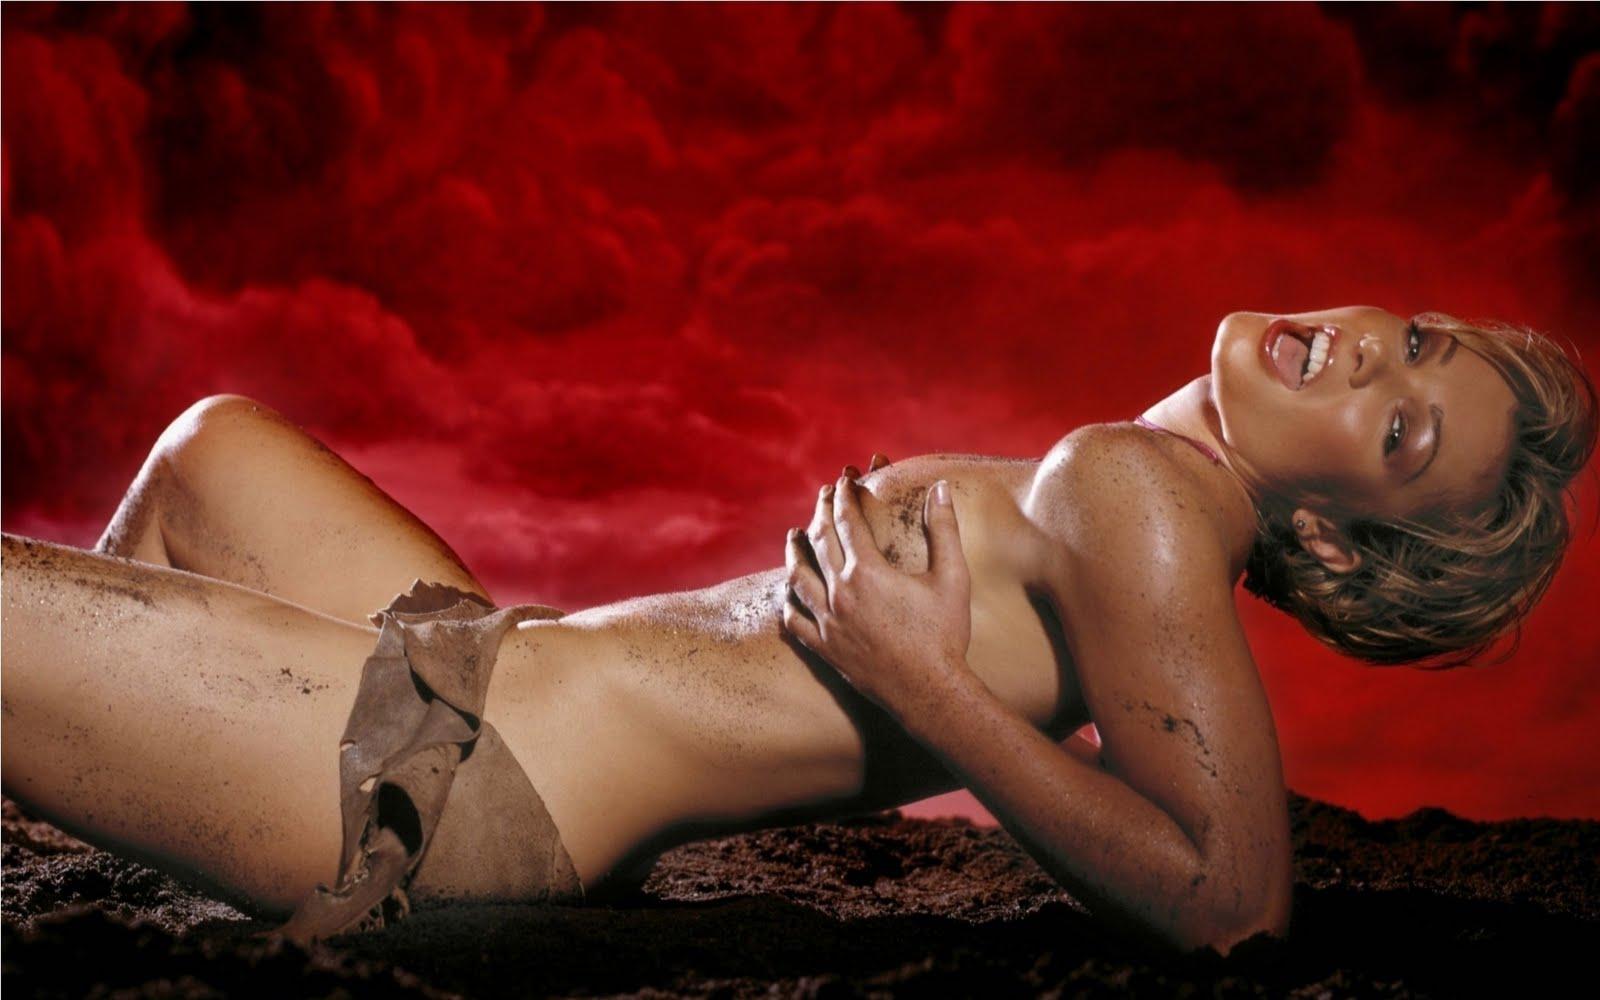 hot girl stips naked and master bates videos